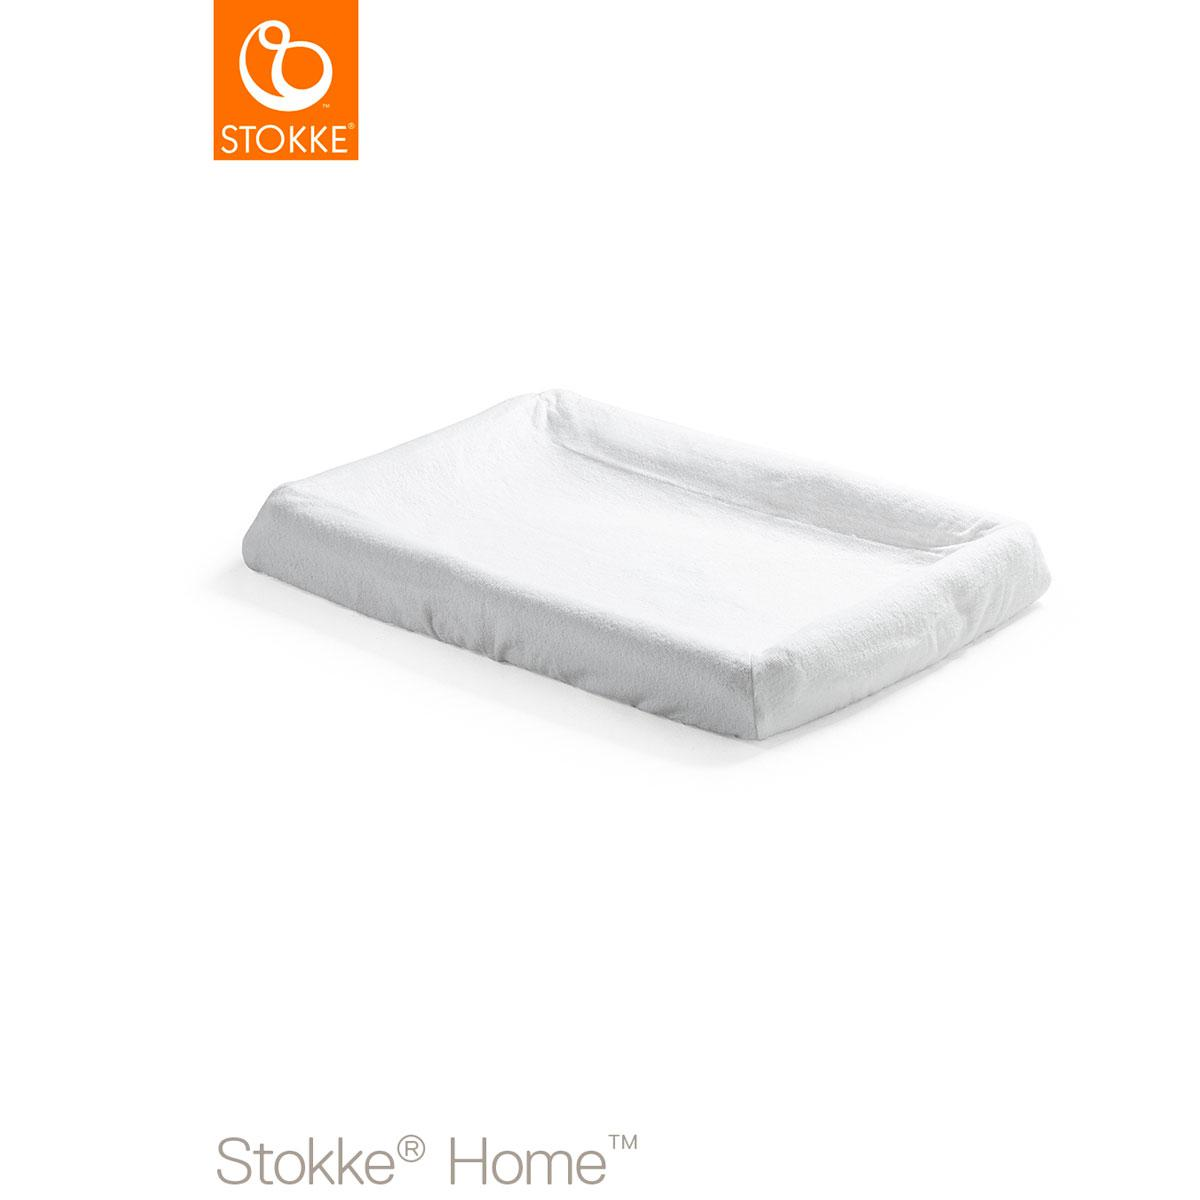 Housse matelas à langer HOME Stokke blanc